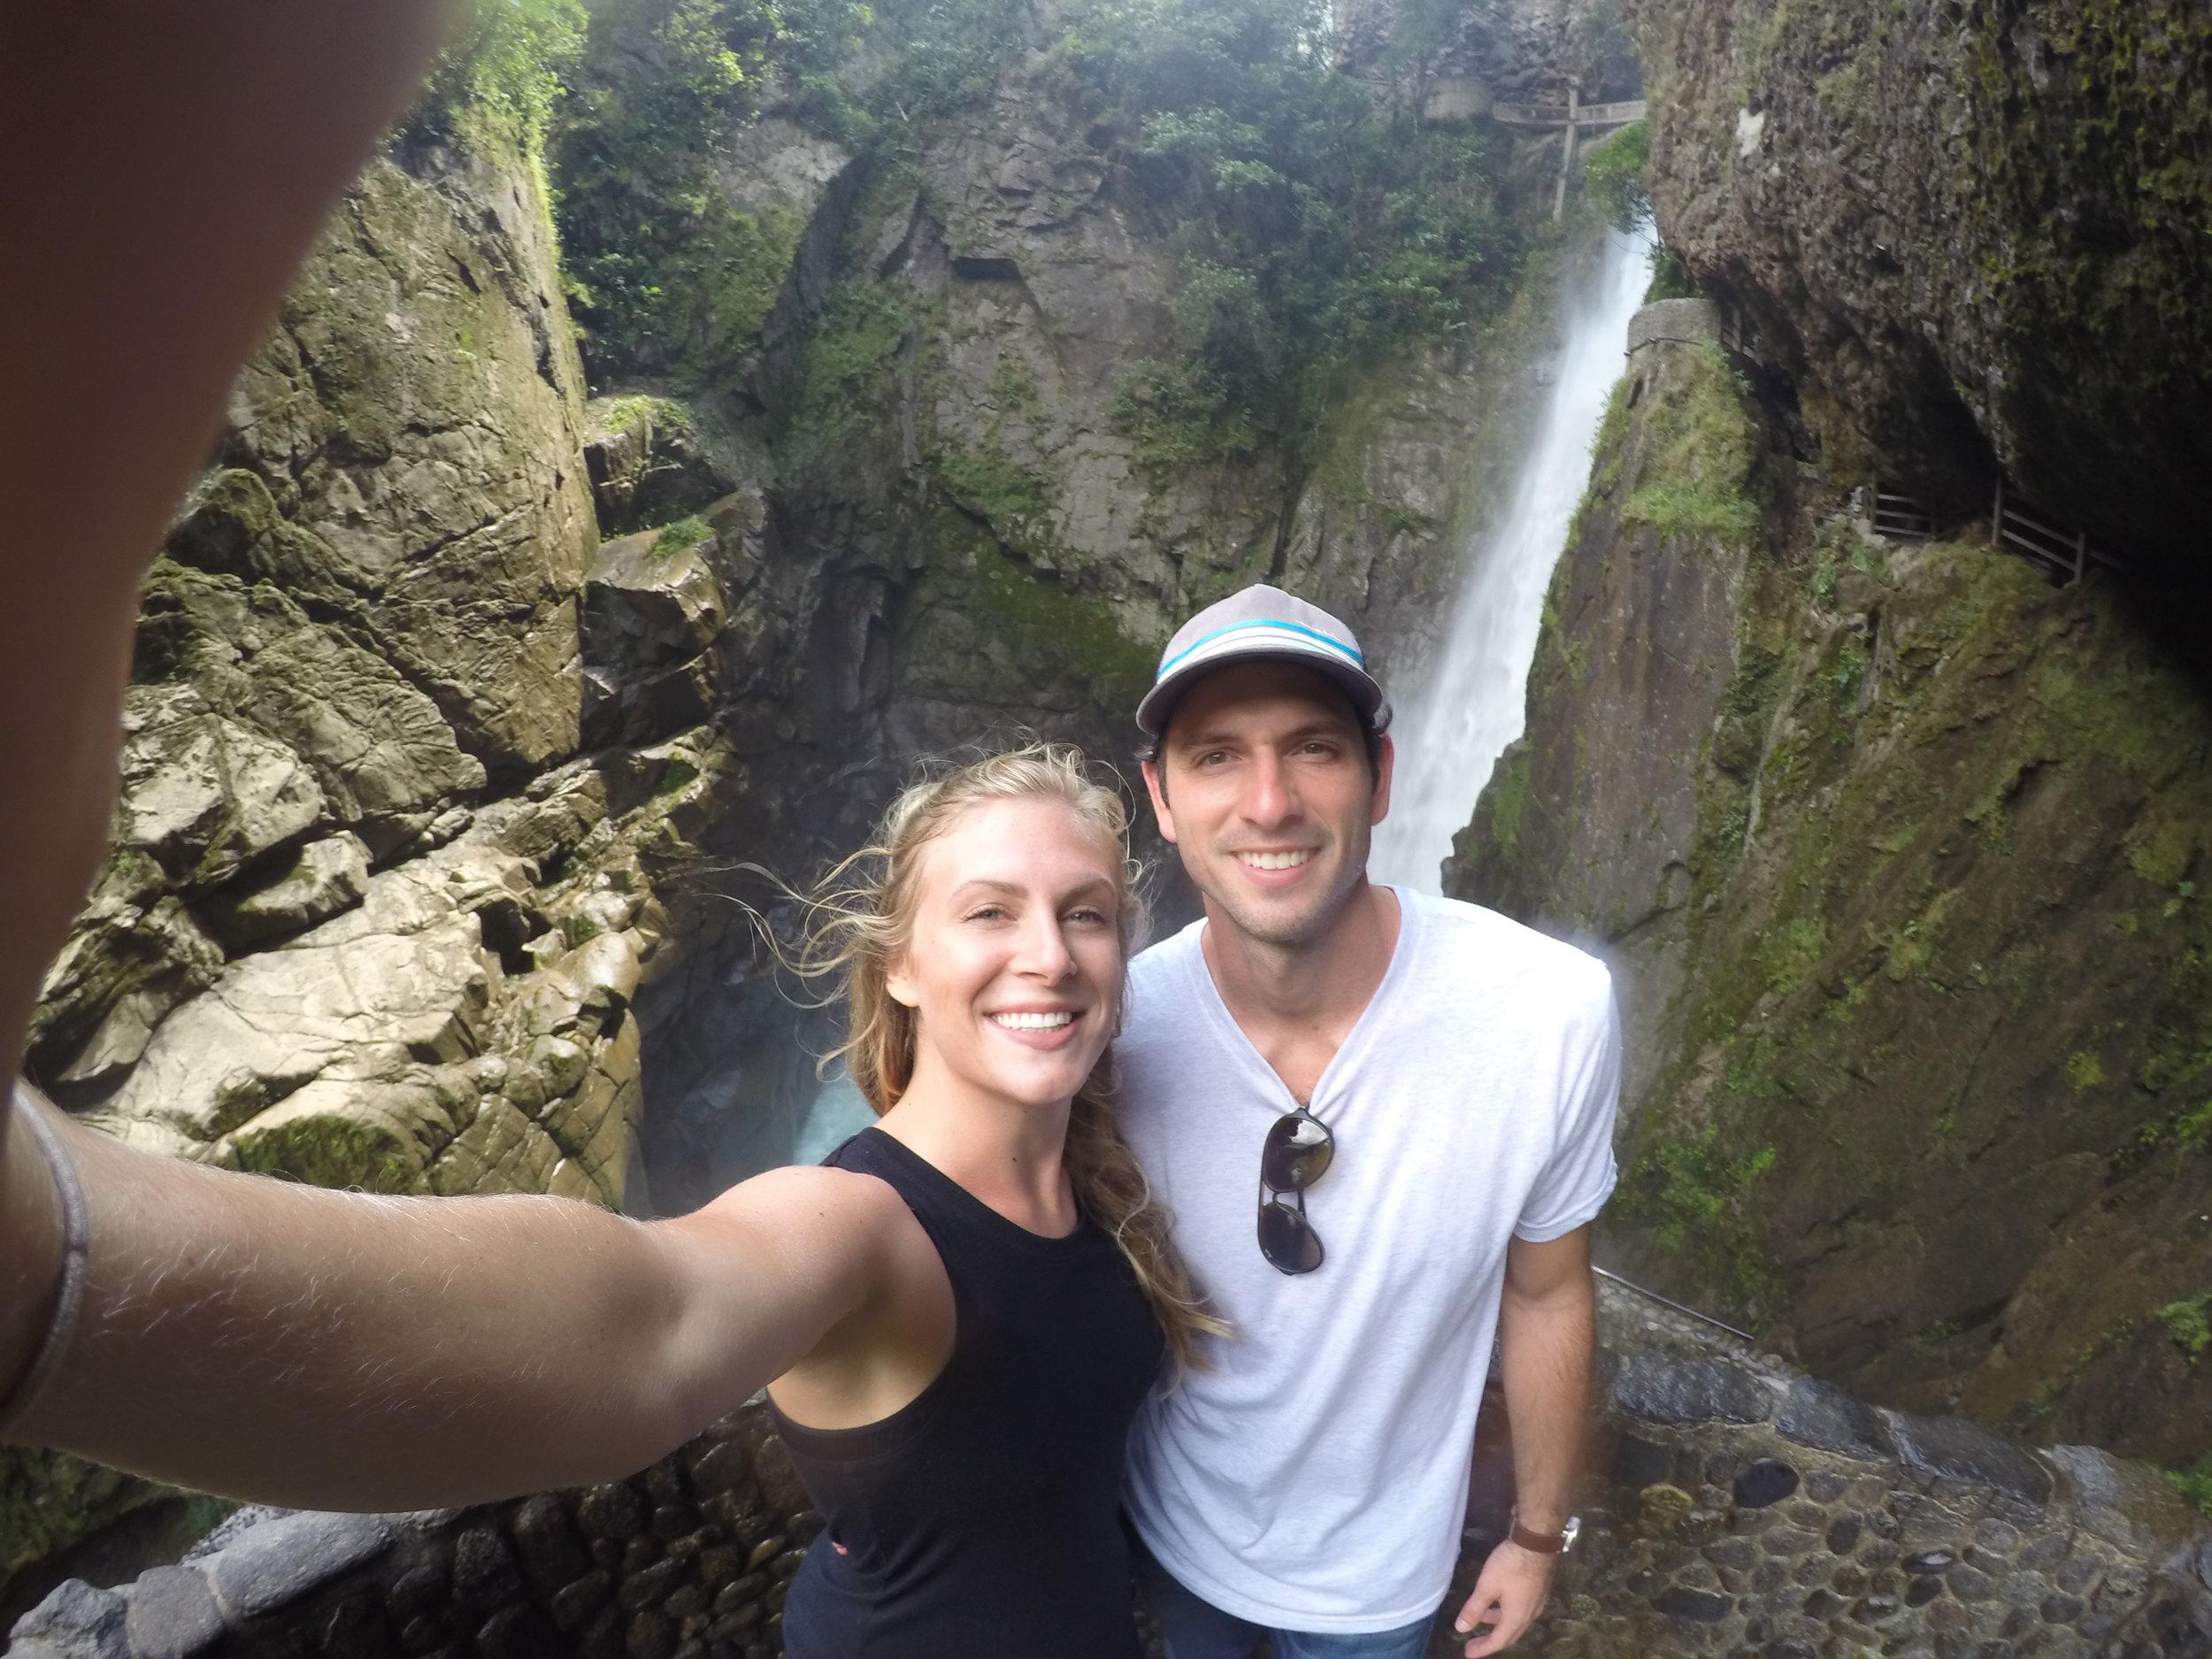 Waterfall_ecuador_Devil's throad.JPG